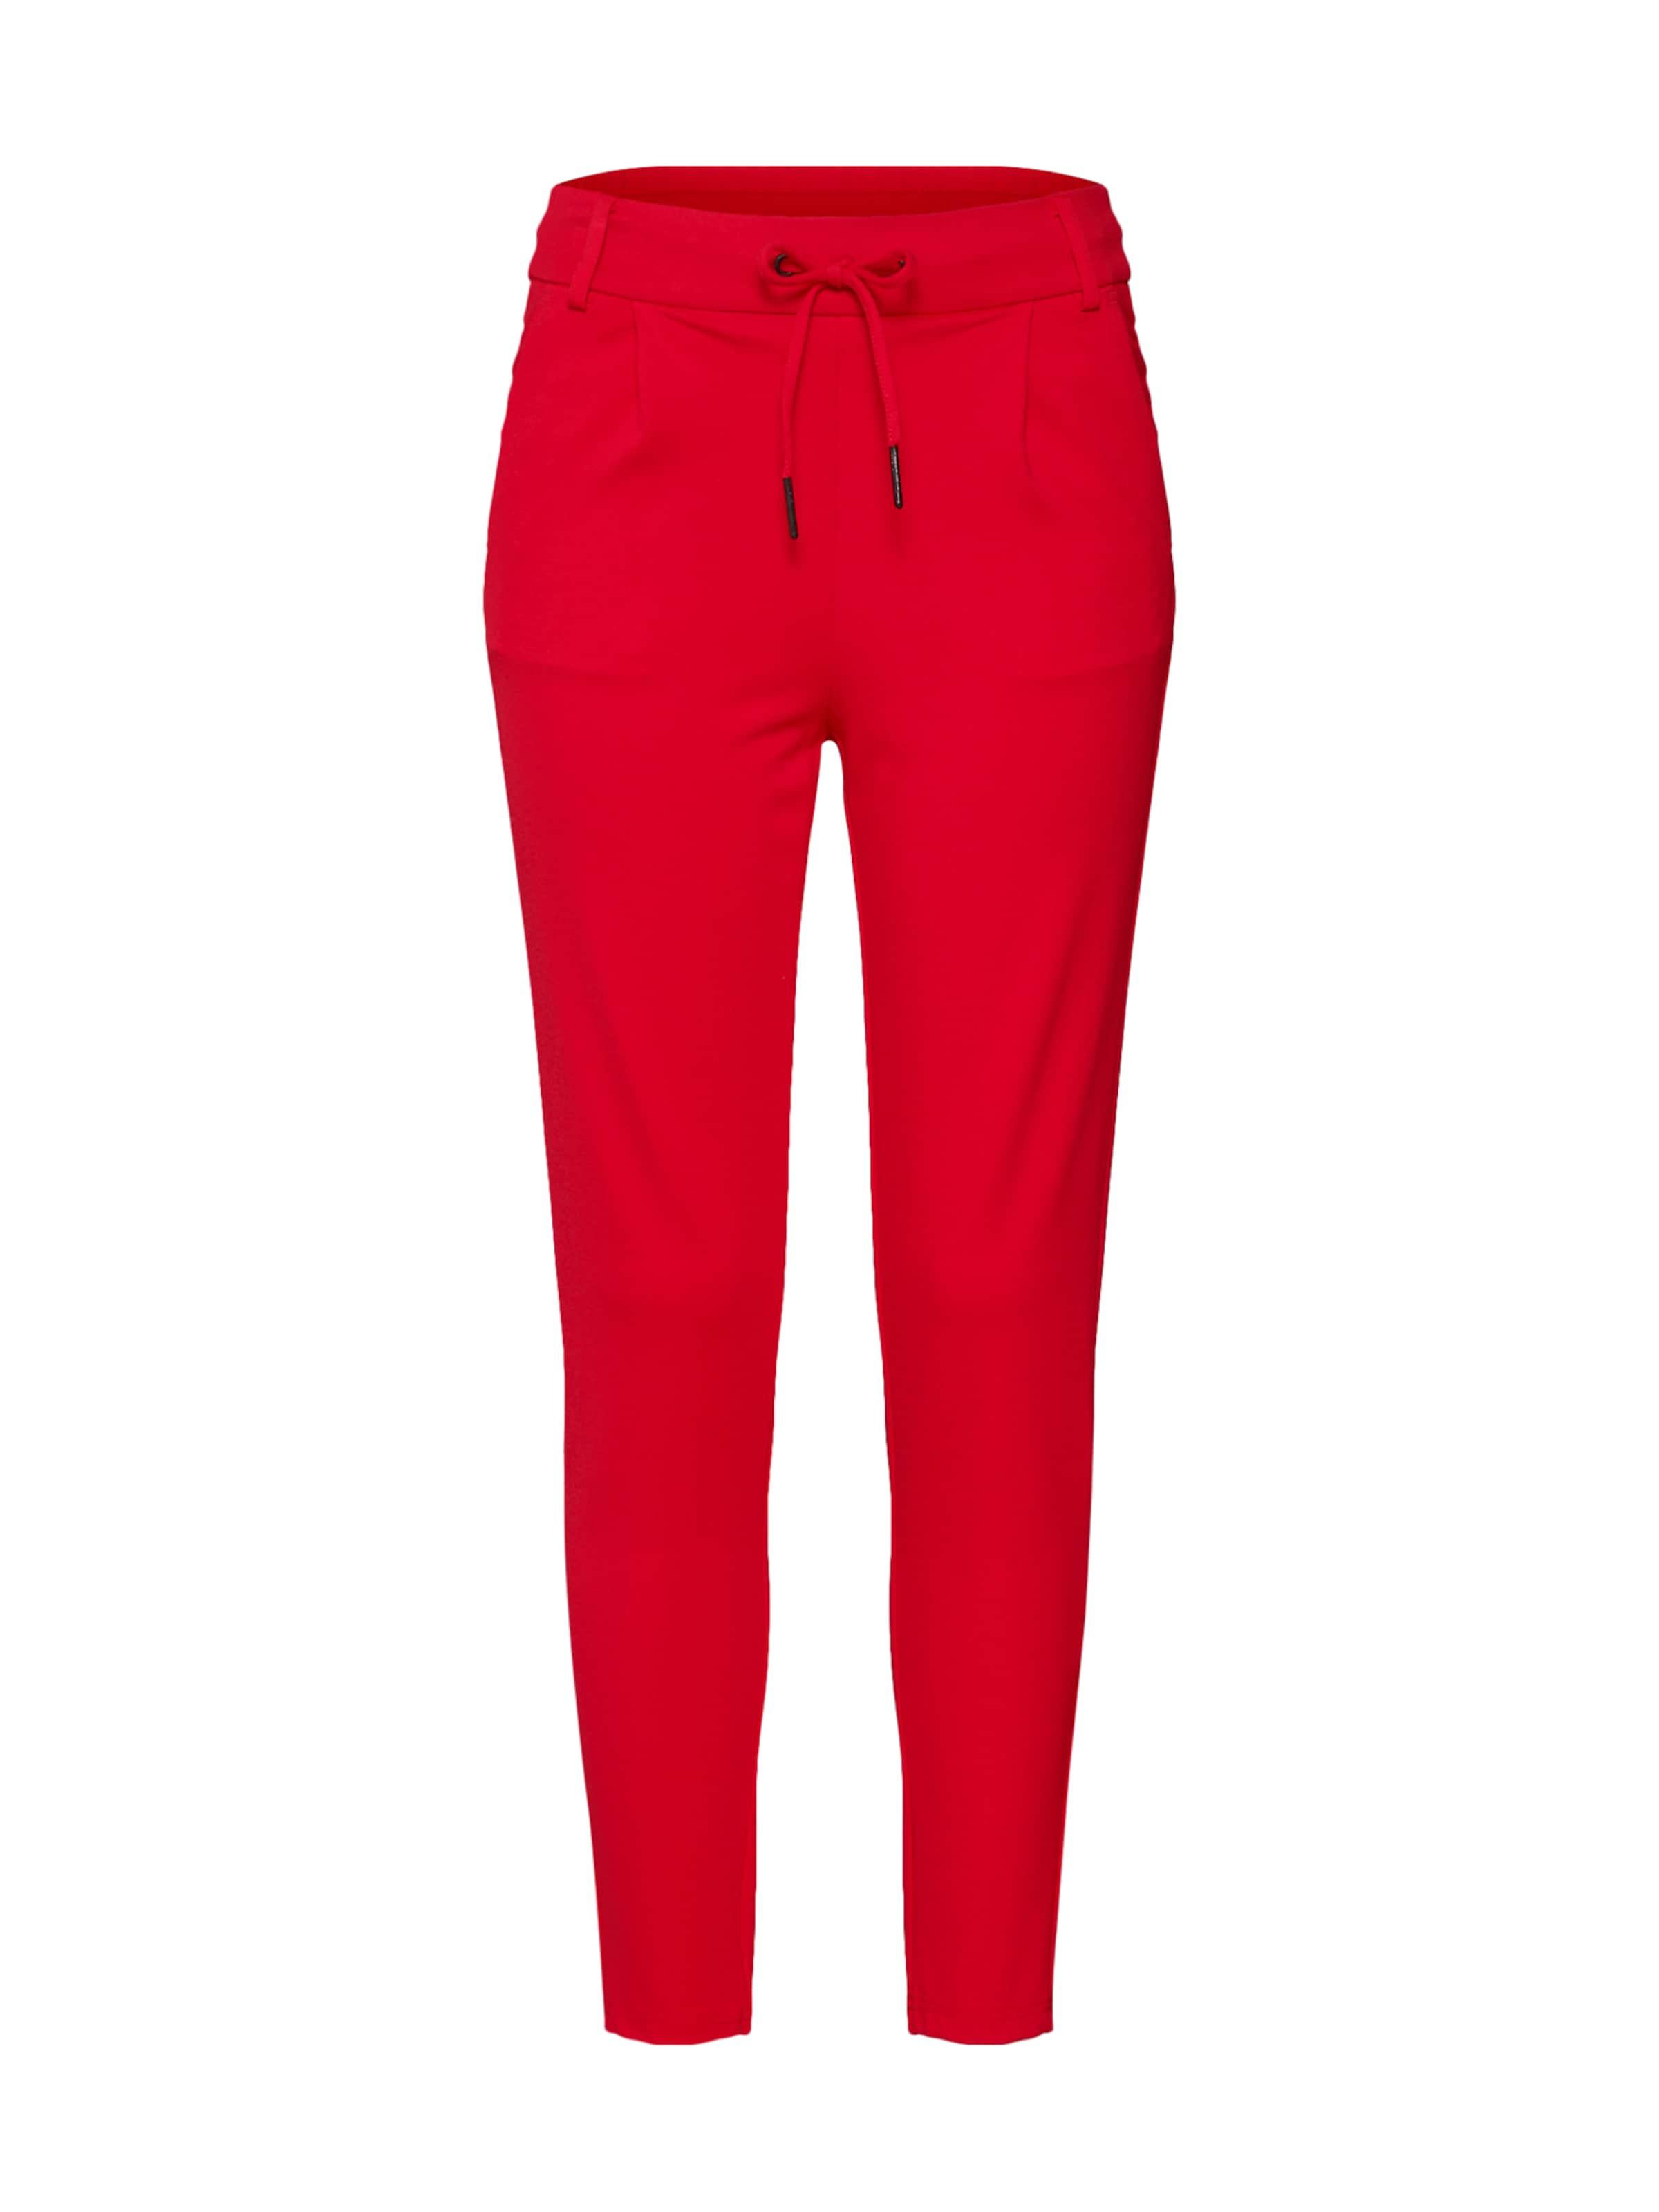 Rouge En 'power' May À Noisy Pantalon Pince MjVpLqSUGz